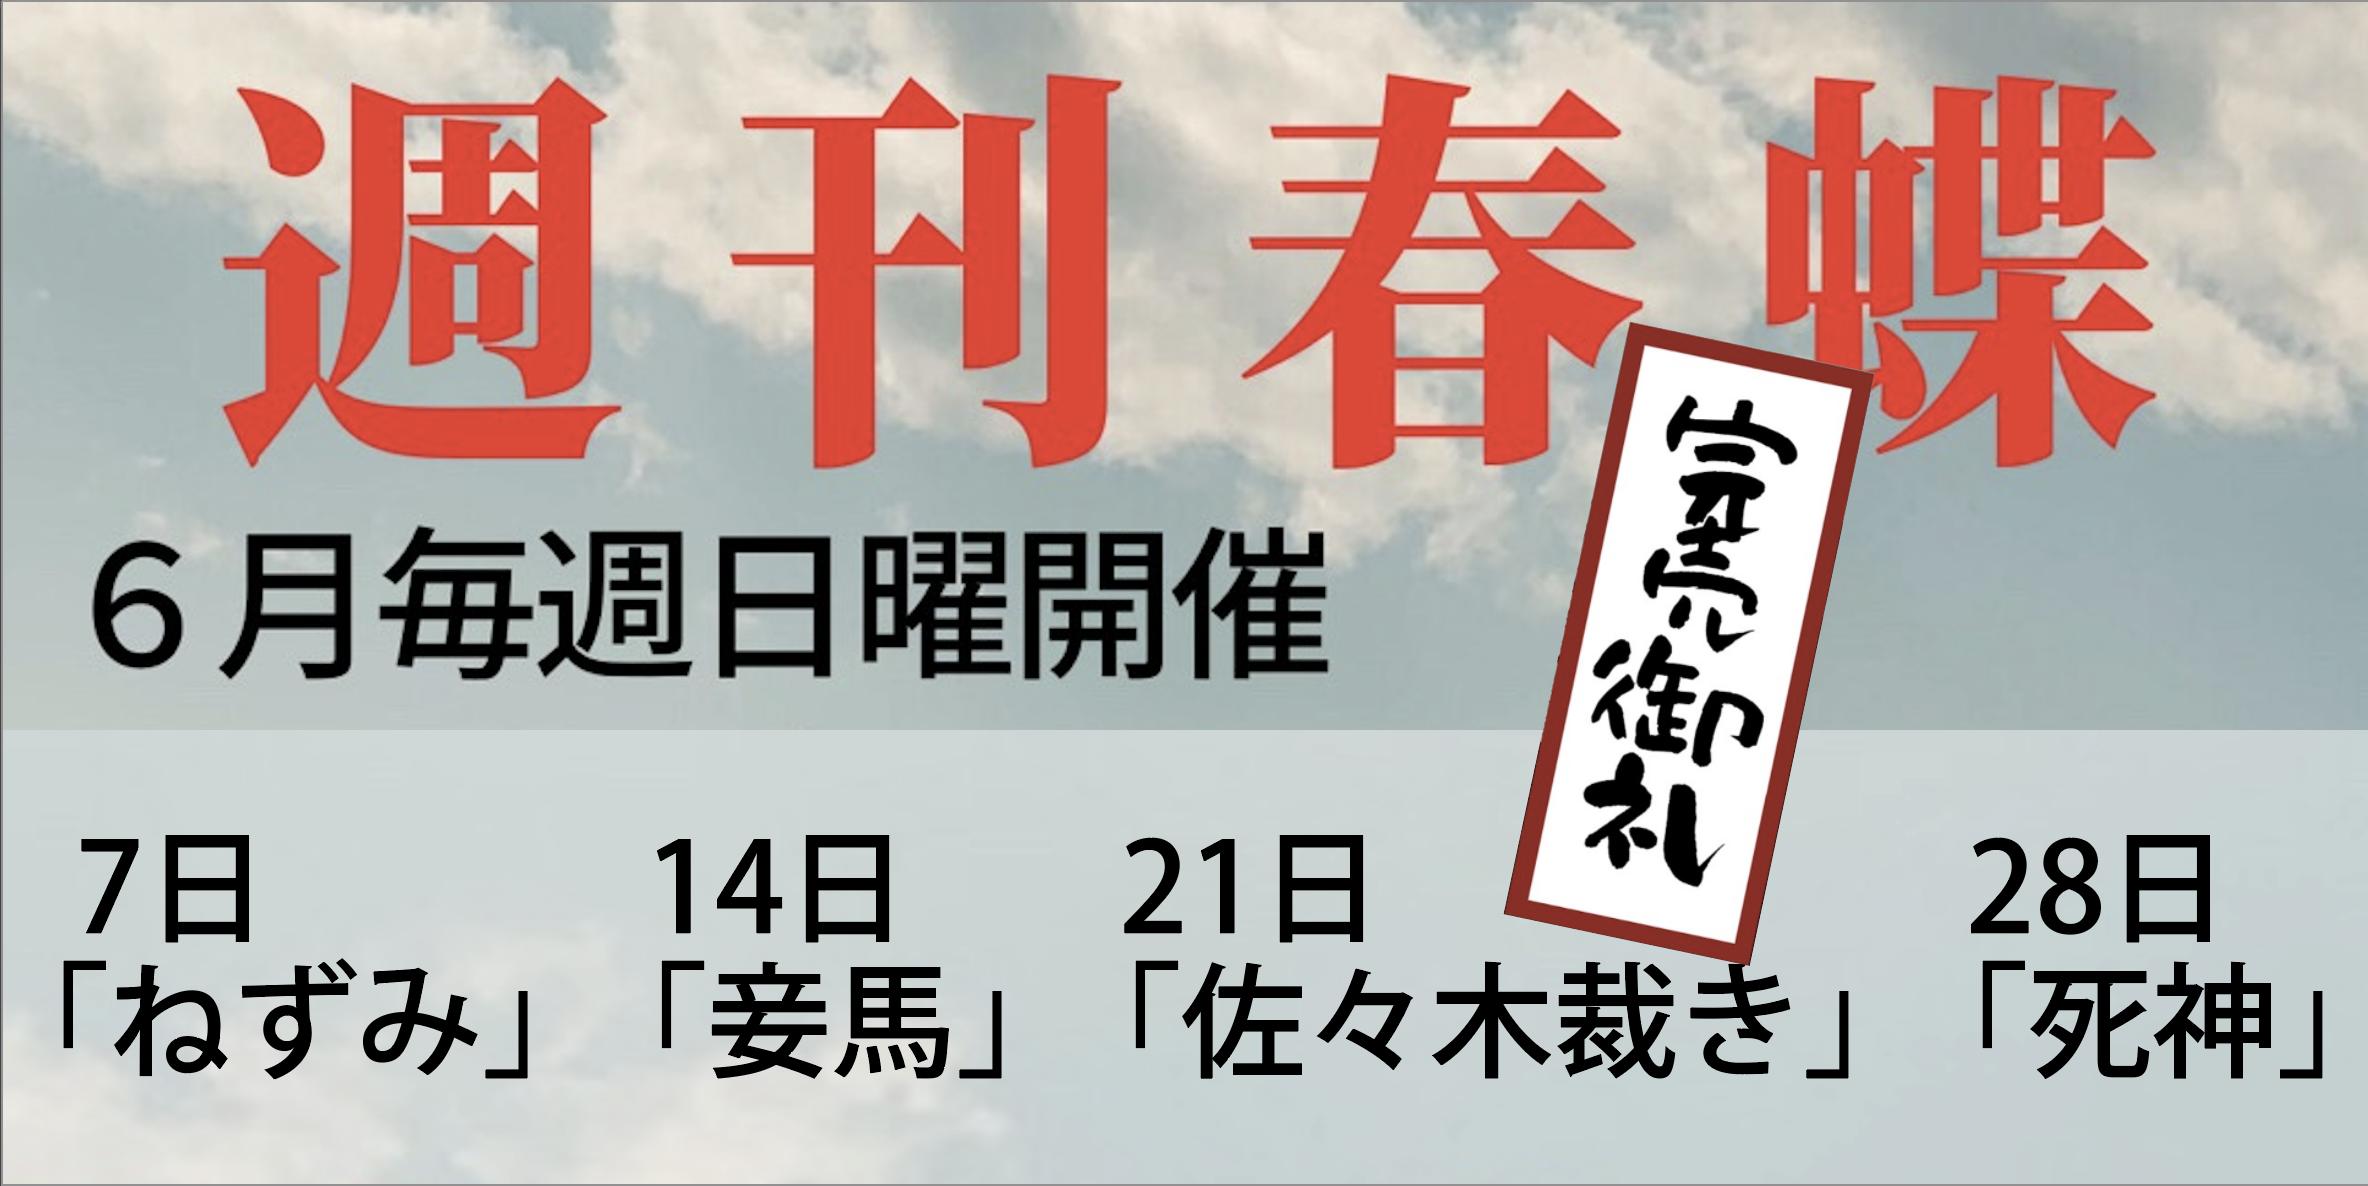 【完売御礼】週間春蝶 6月毎週日曜開催・桂春蝶のリハビリ落語会